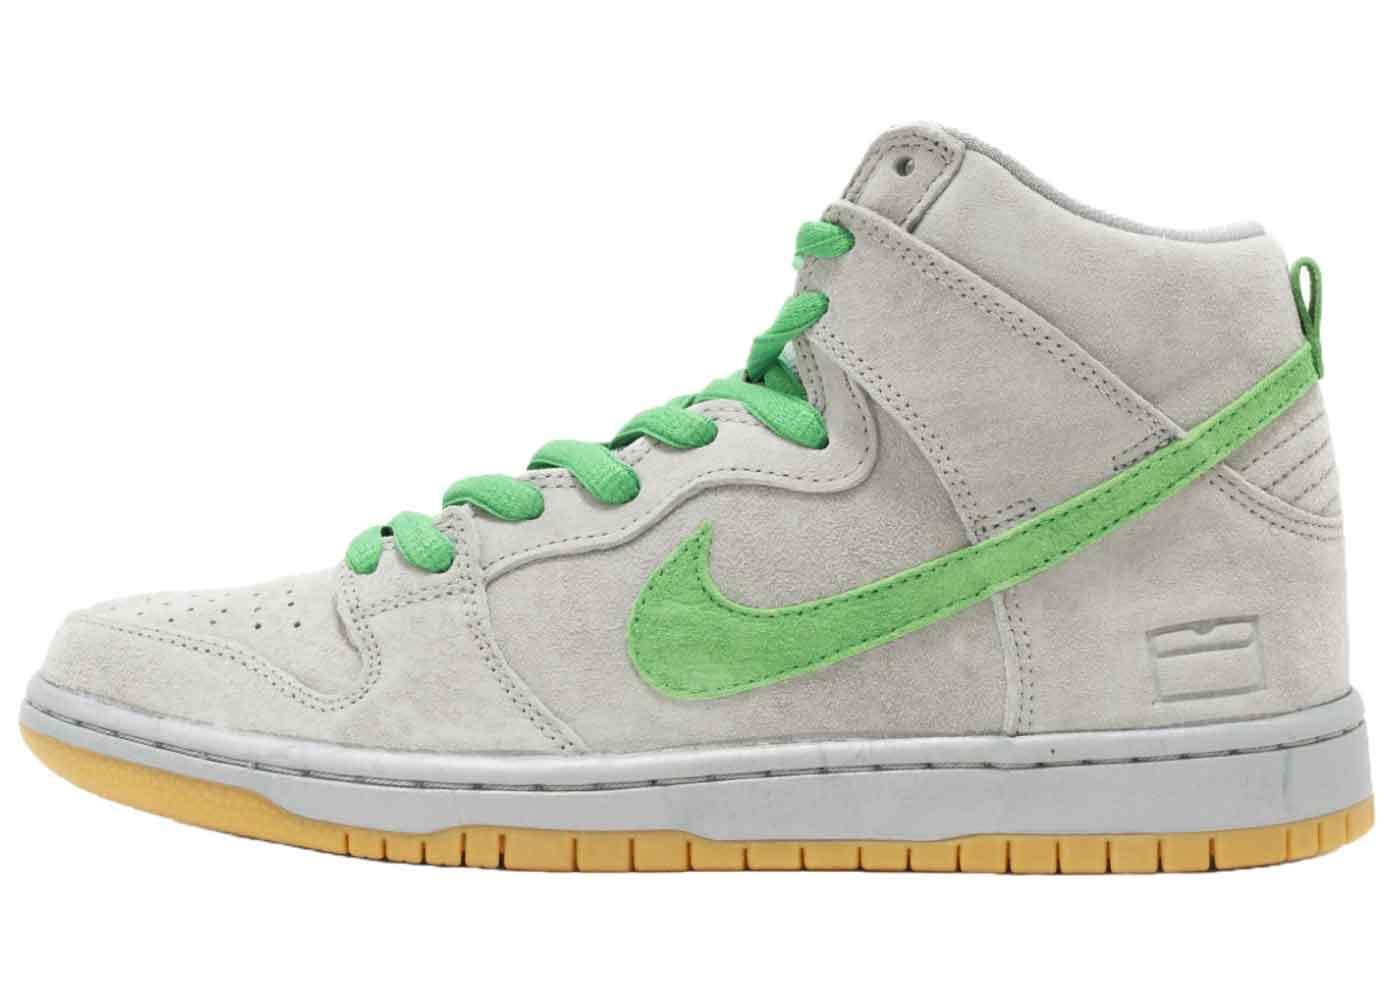 Nike SB Dunk High Silver Boxの写真